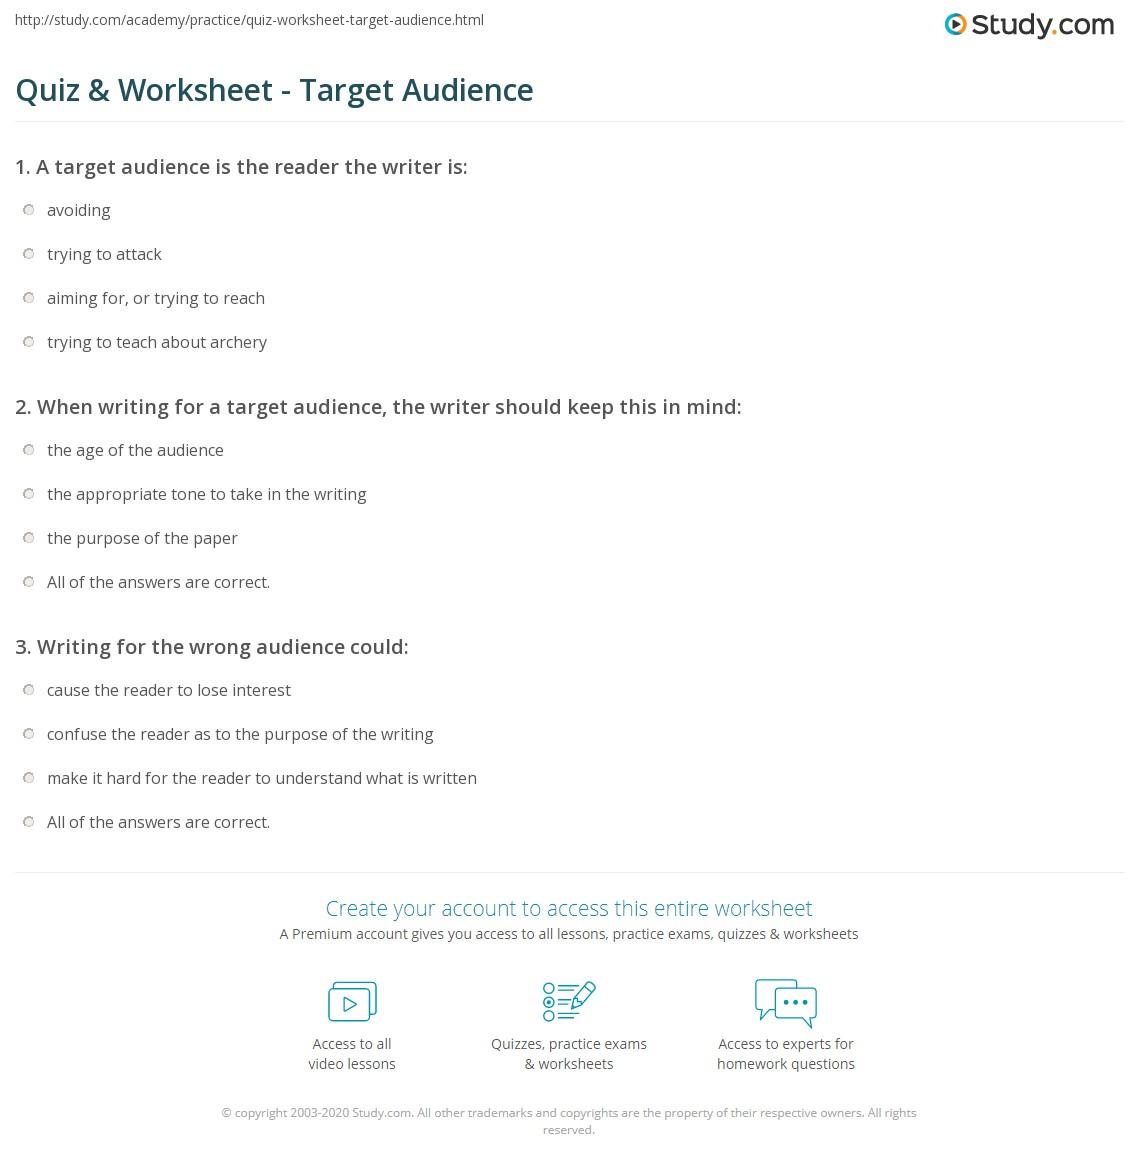 Quiz & Worksheet - Target Audience | Study.com